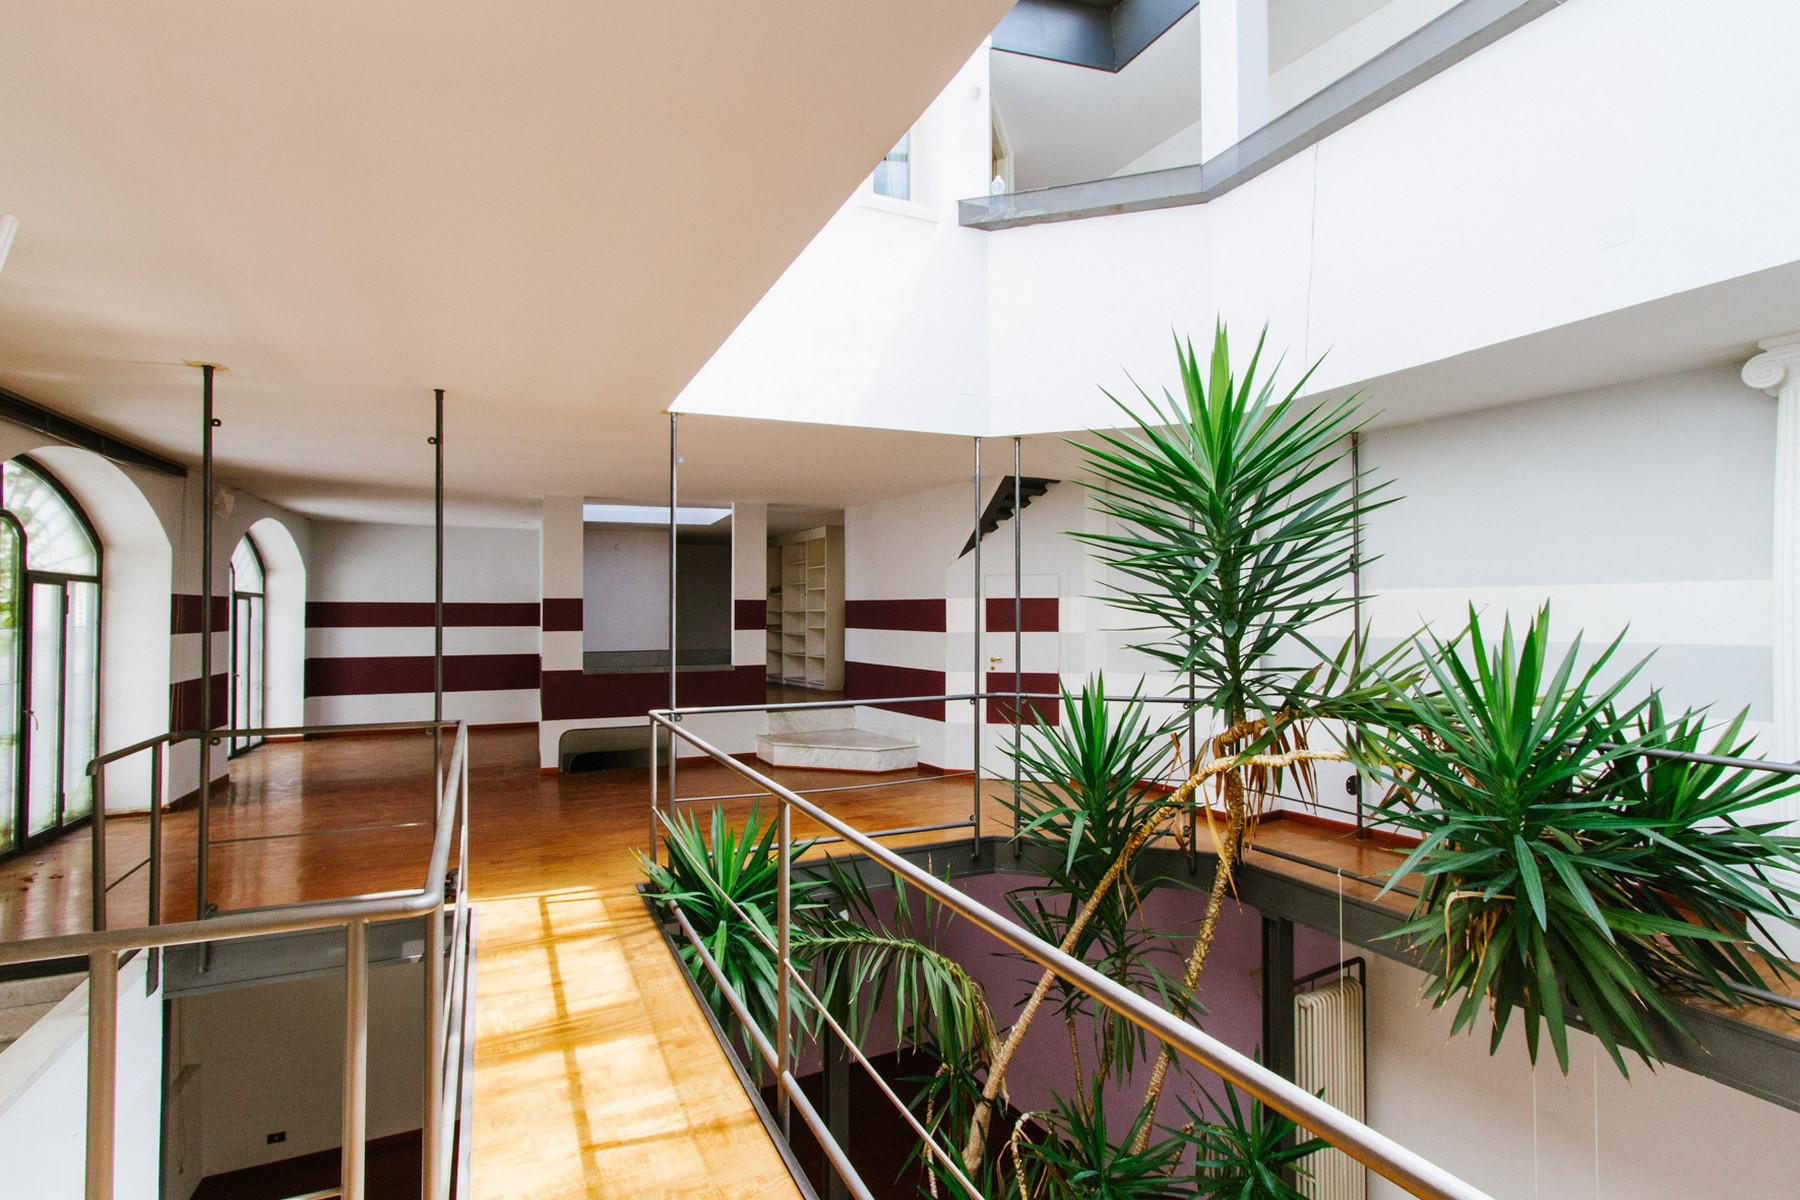 Casa indipendente in Vendita a Torino: 5 locali, 699 mq - Foto 8